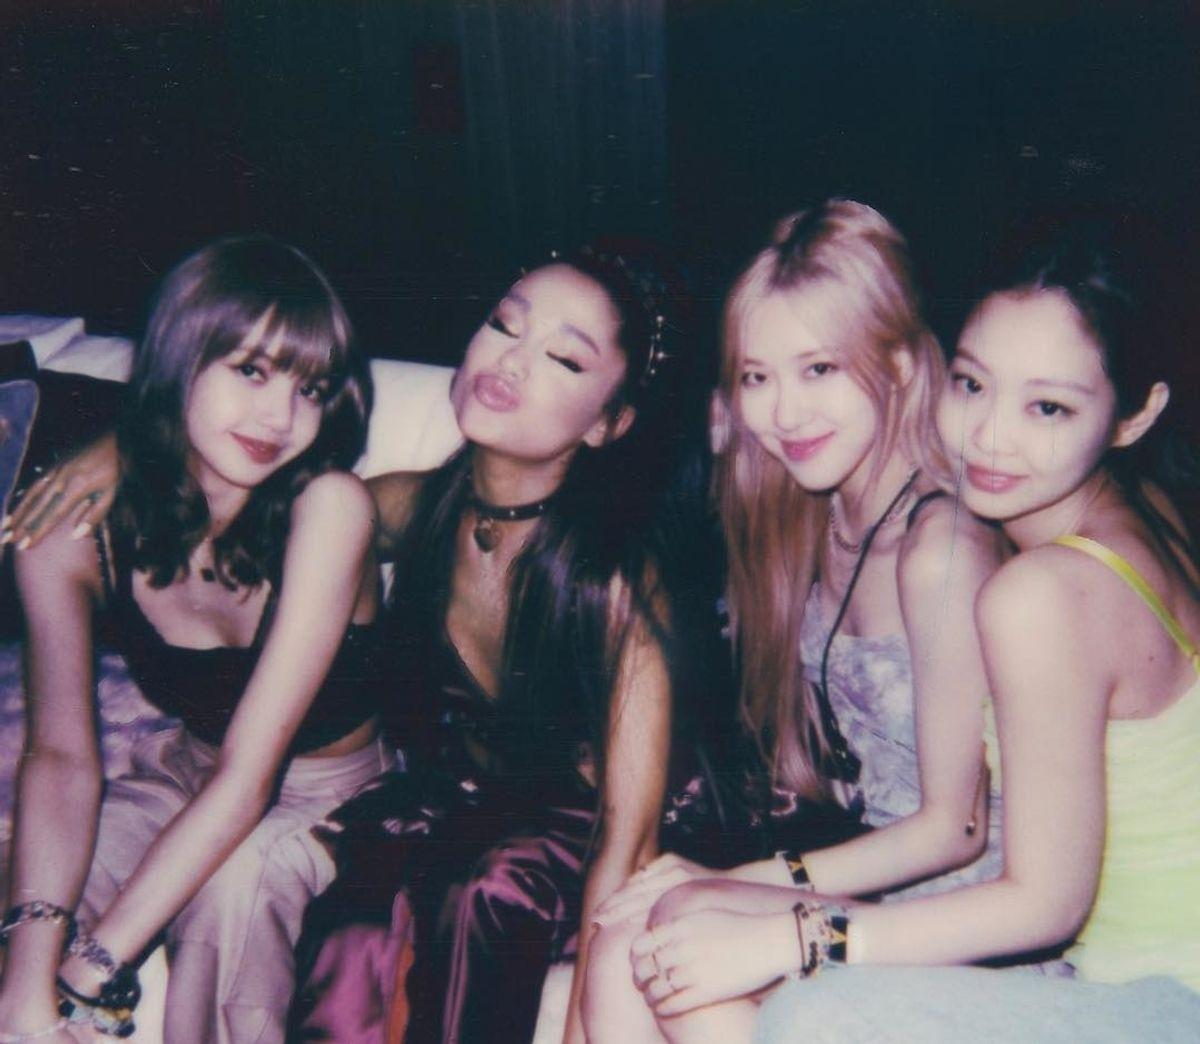 We Finally Got an Ariana Grande x BLACKPINK Photo